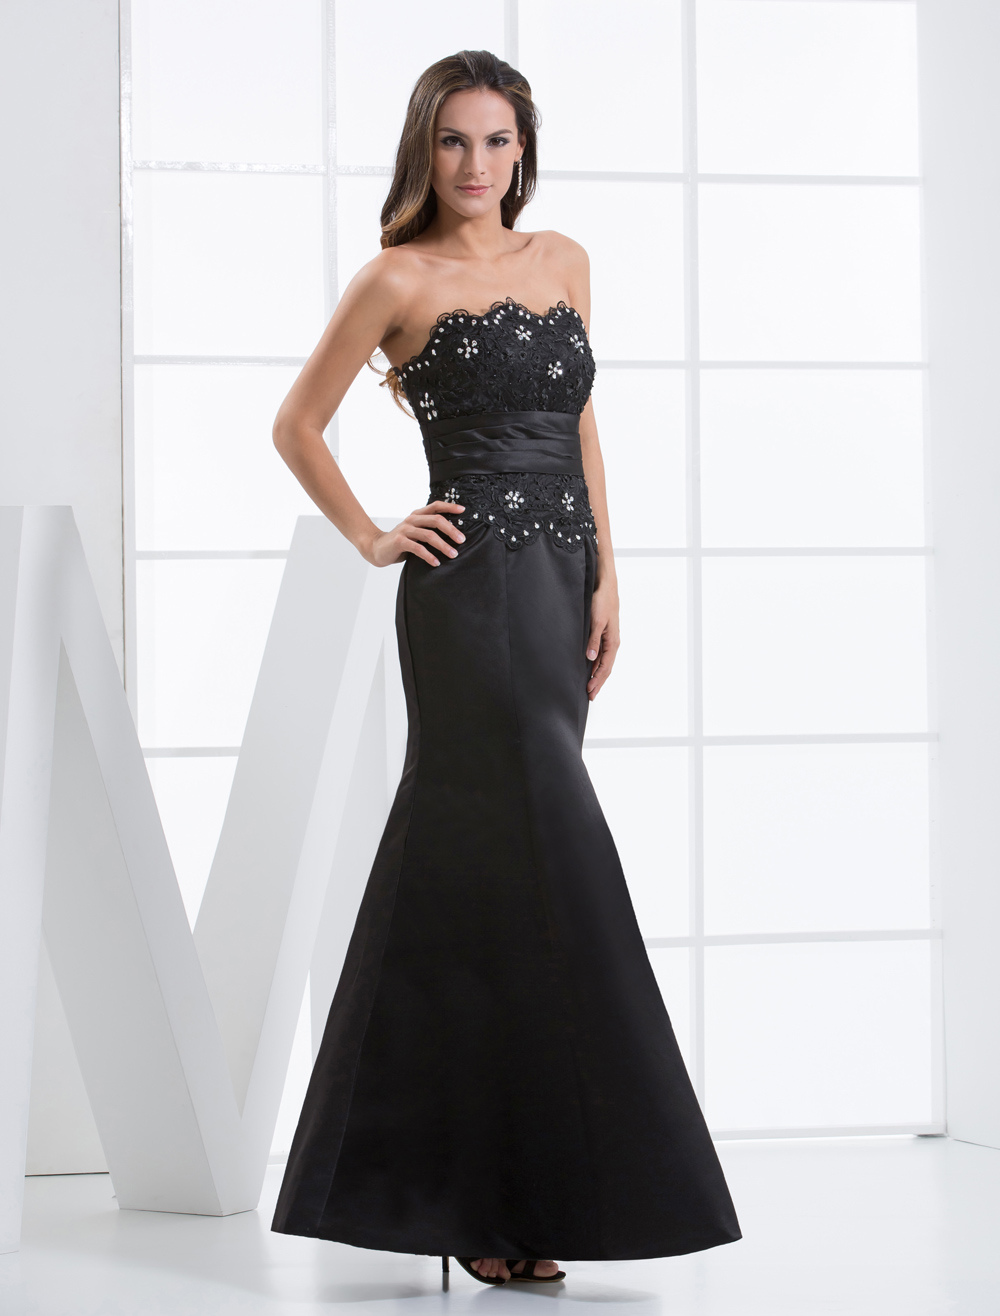 Gorgeous Black Sheath Applique Beading Satin Evening Dress (Wedding Evening Dresses) photo